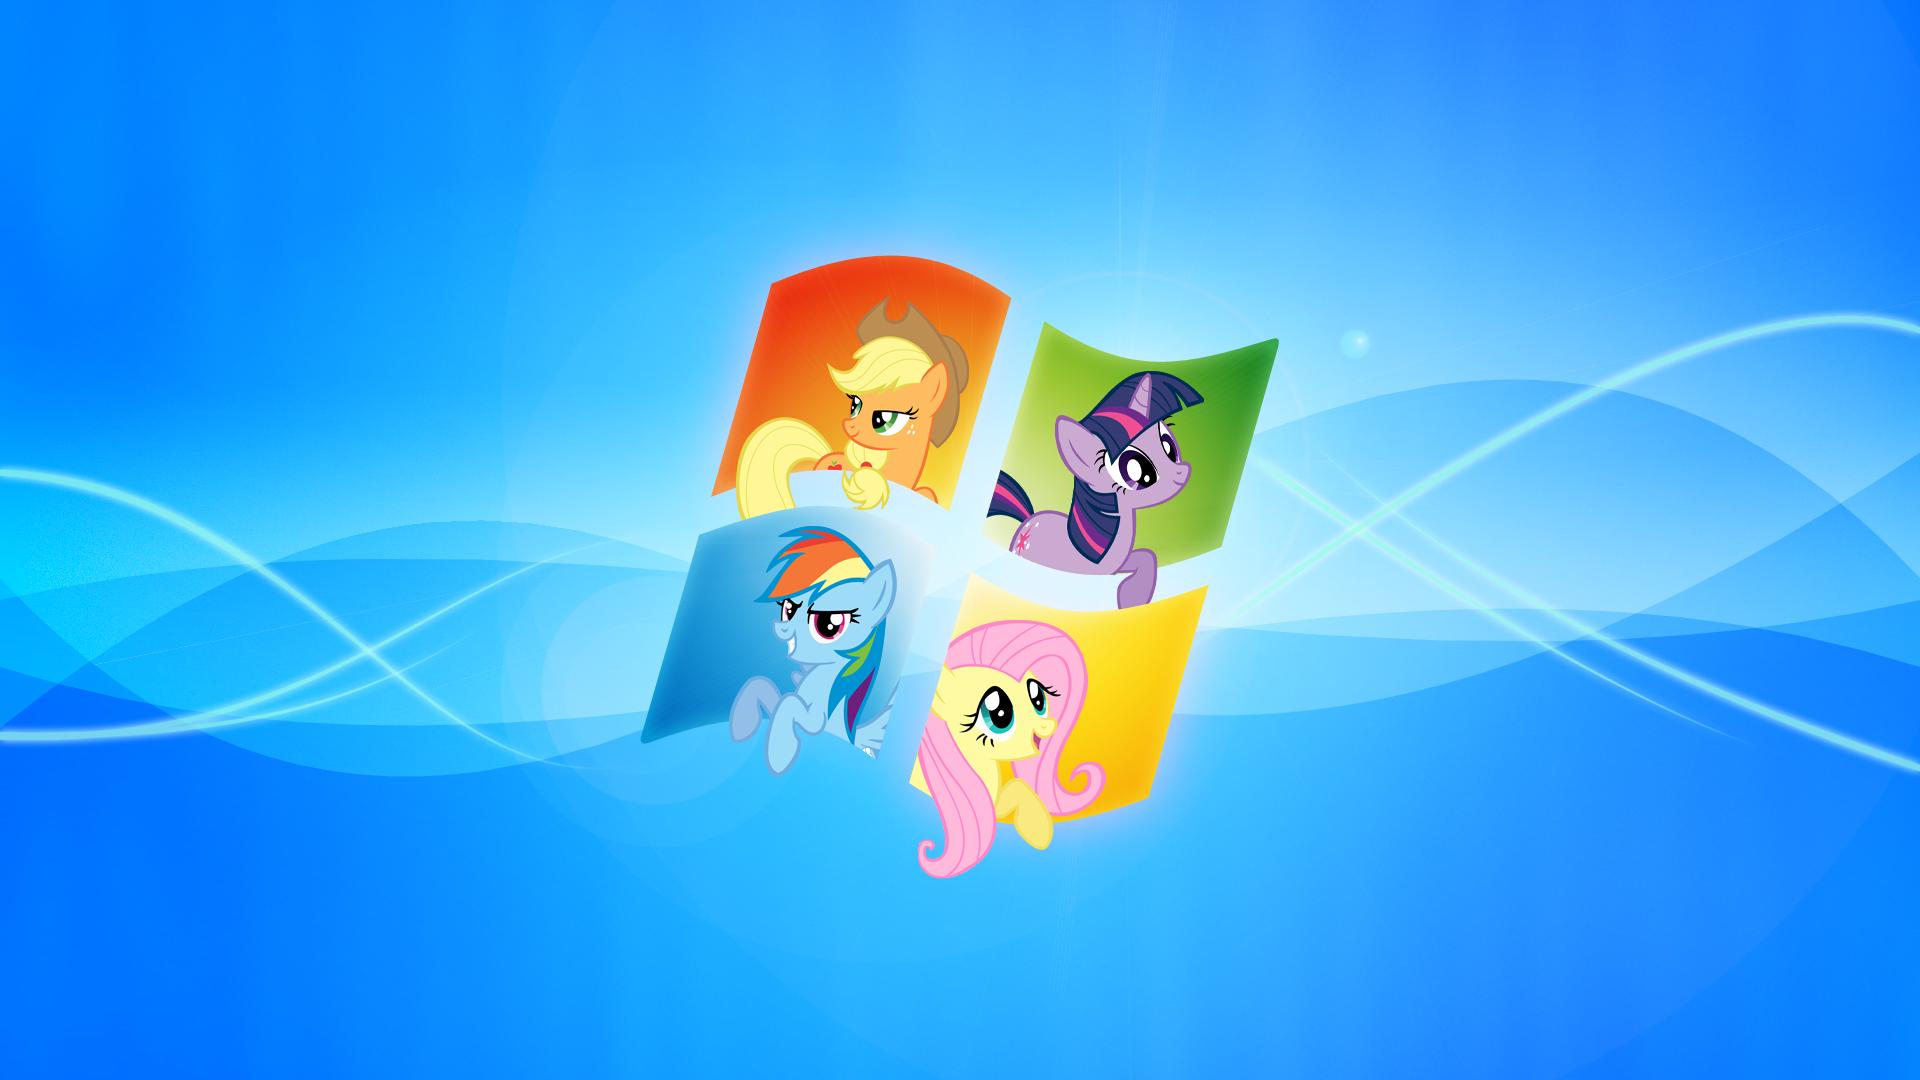 Windows My Little Pony Wallpaper By Piranhaplant1 On Deviantart